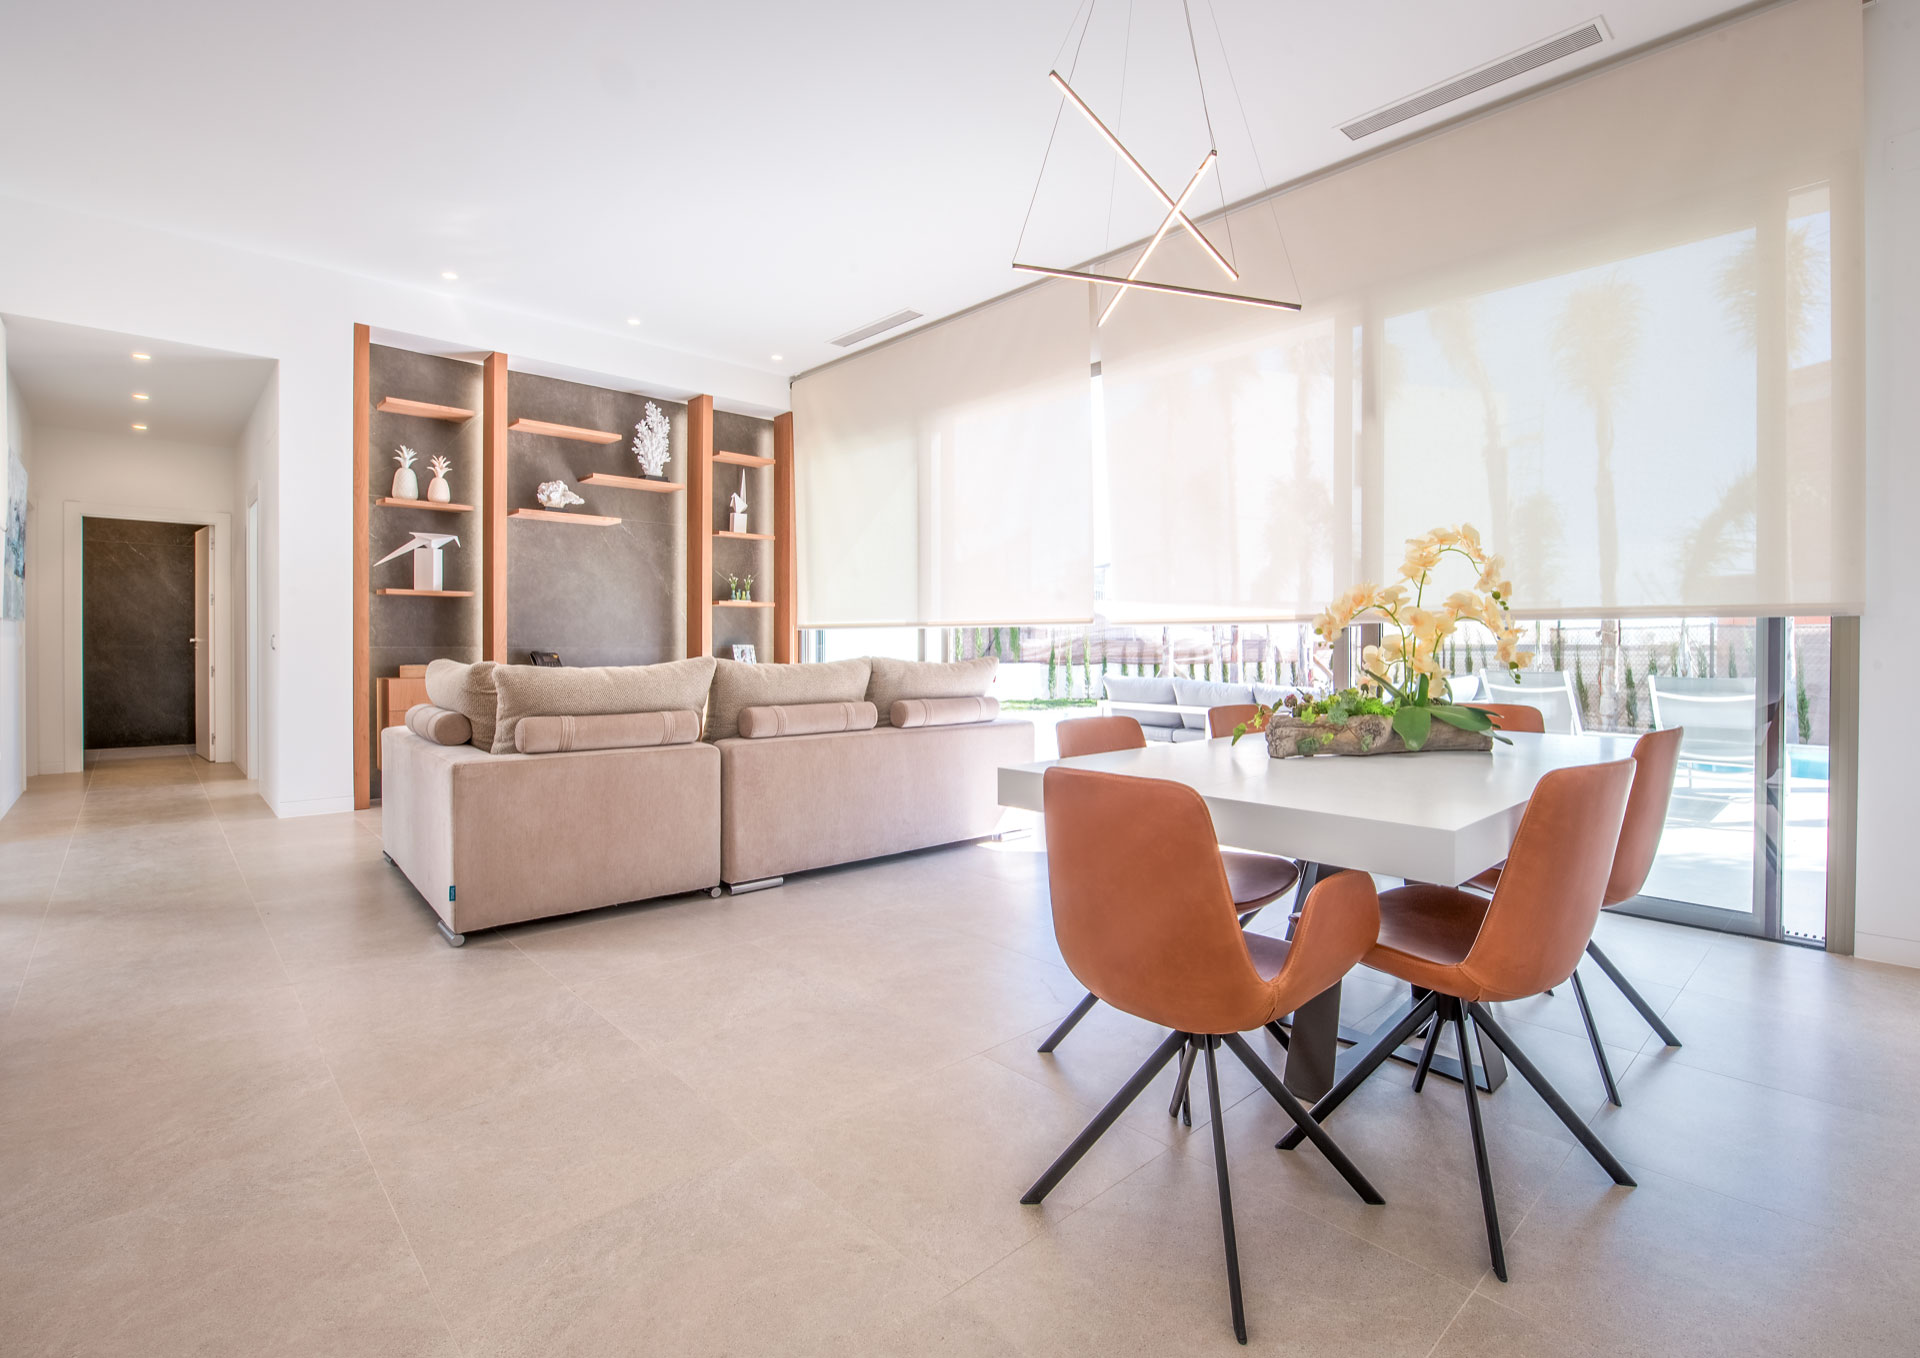 4 bedroom villa For Sale in Finestrat - photograph 8